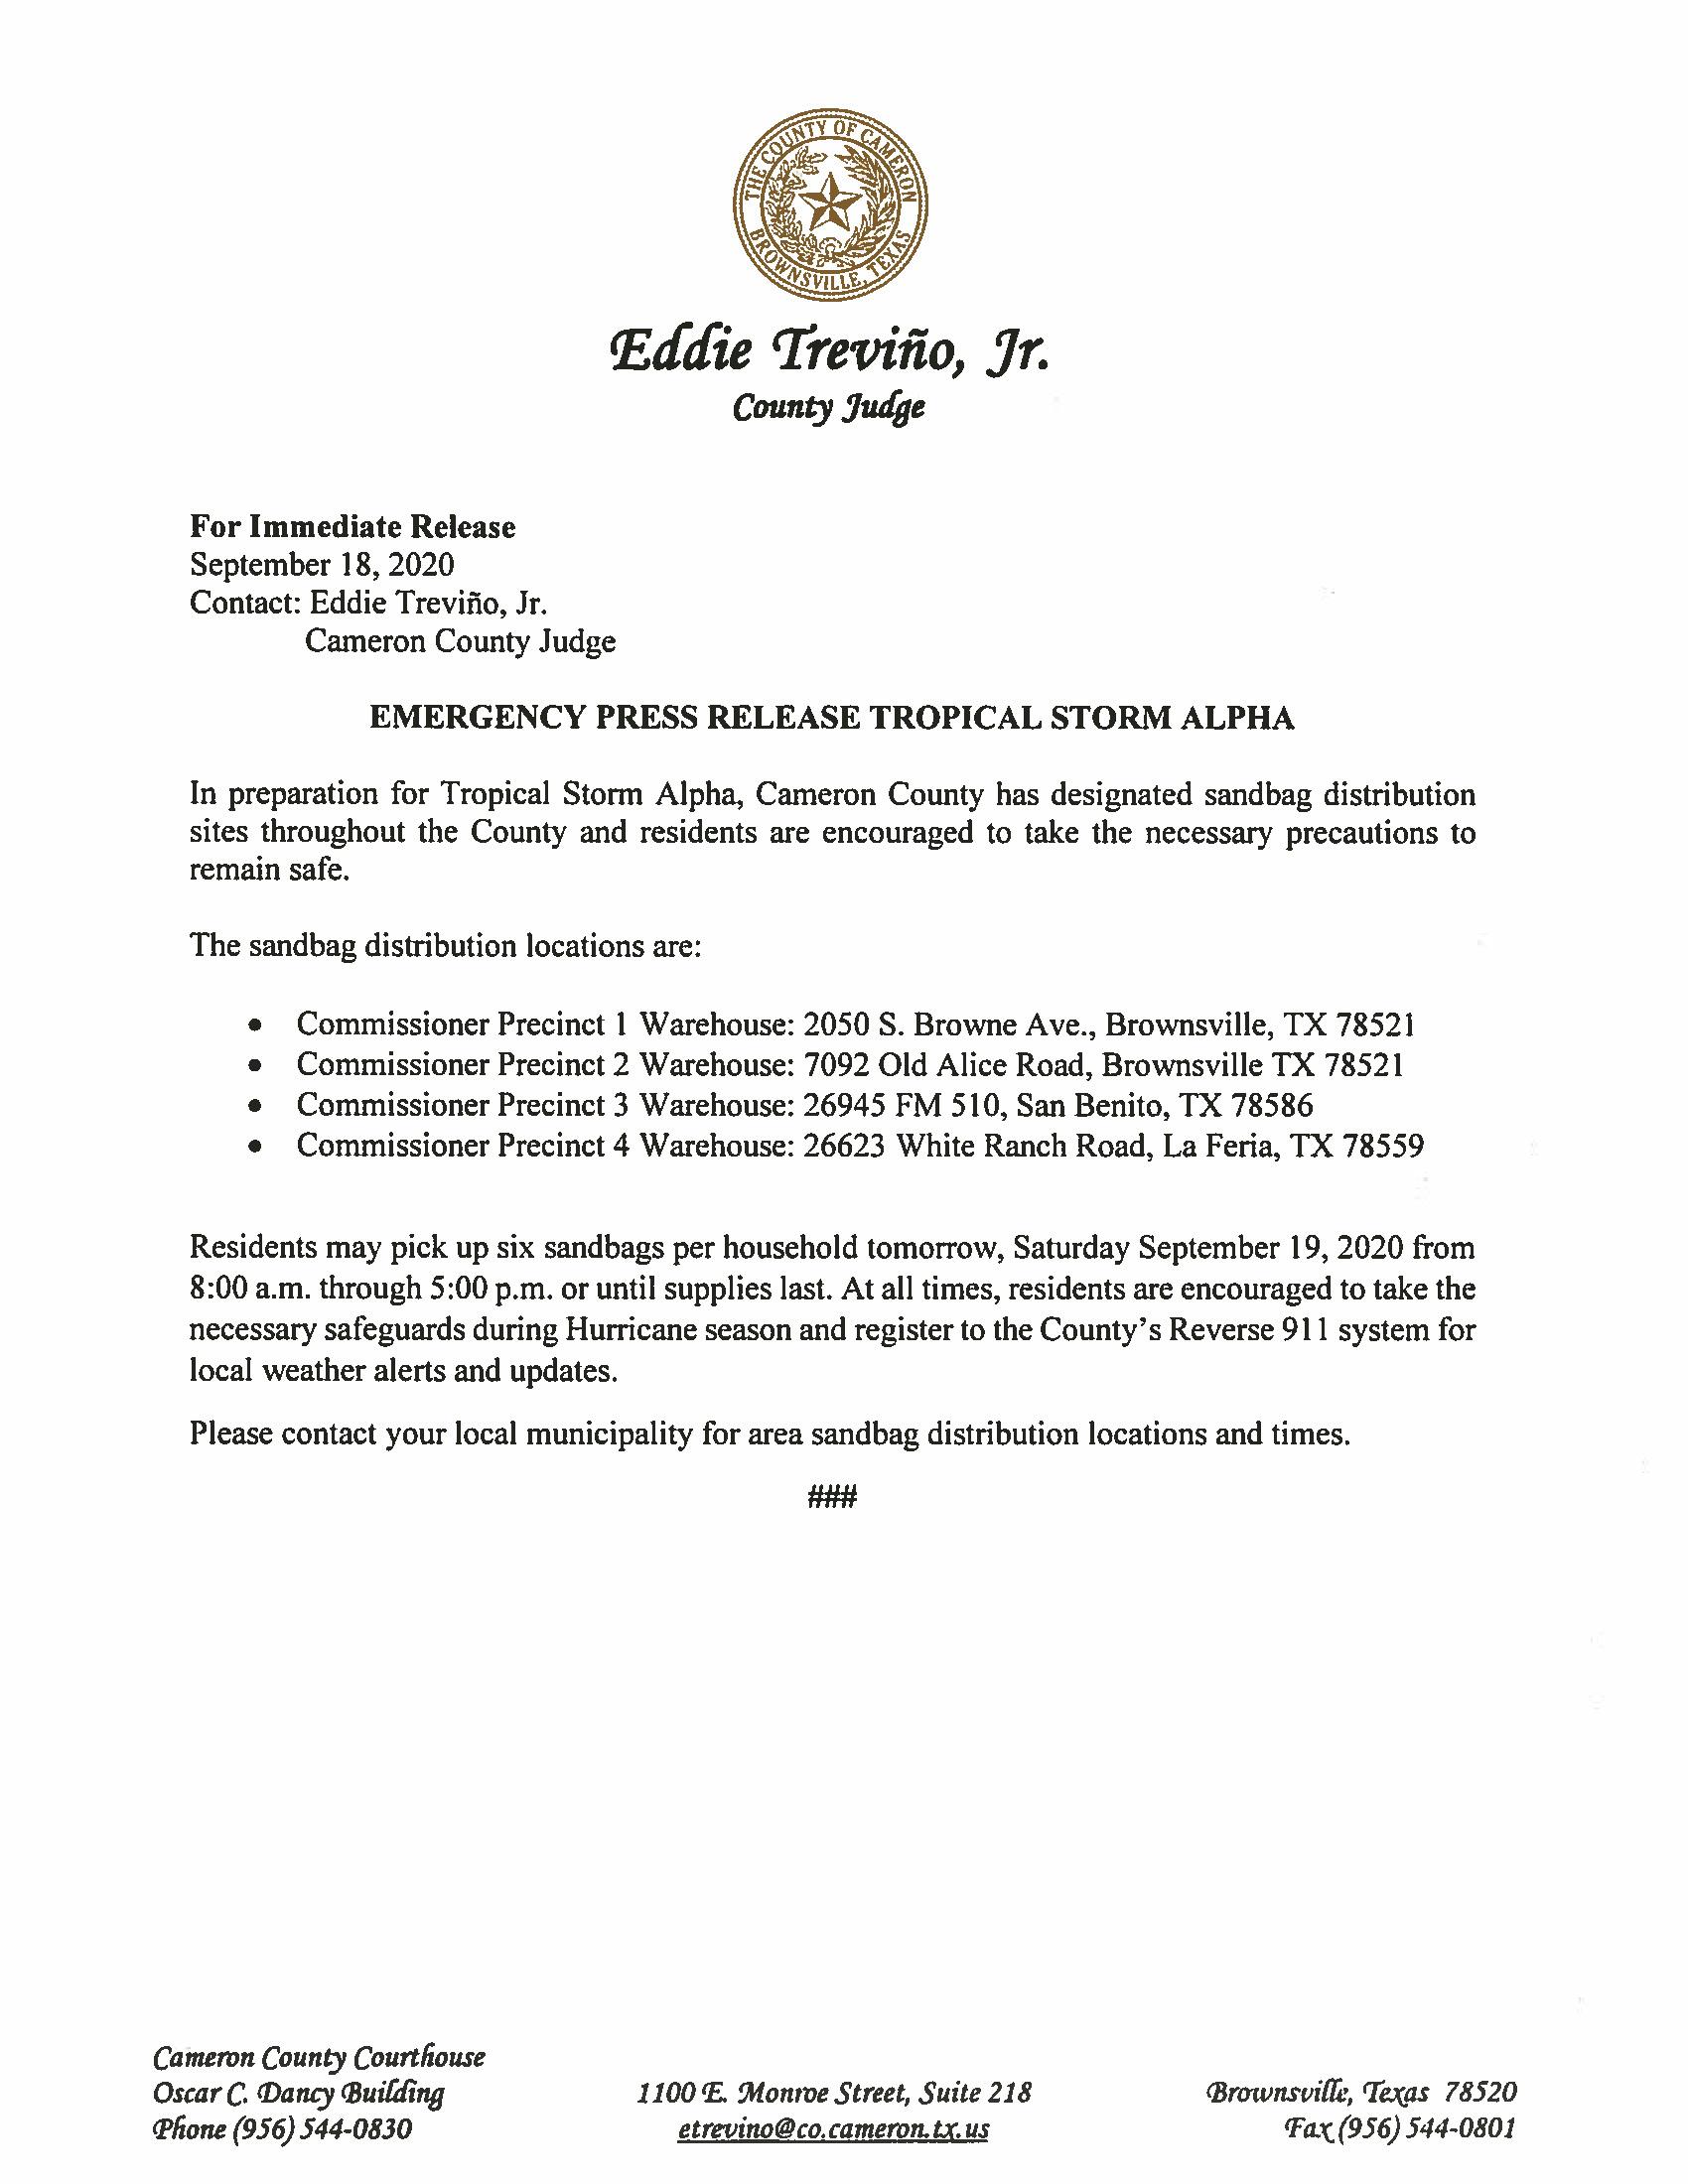 09.18.2020 Emergency Management Press Release Tropical Storm Alpha